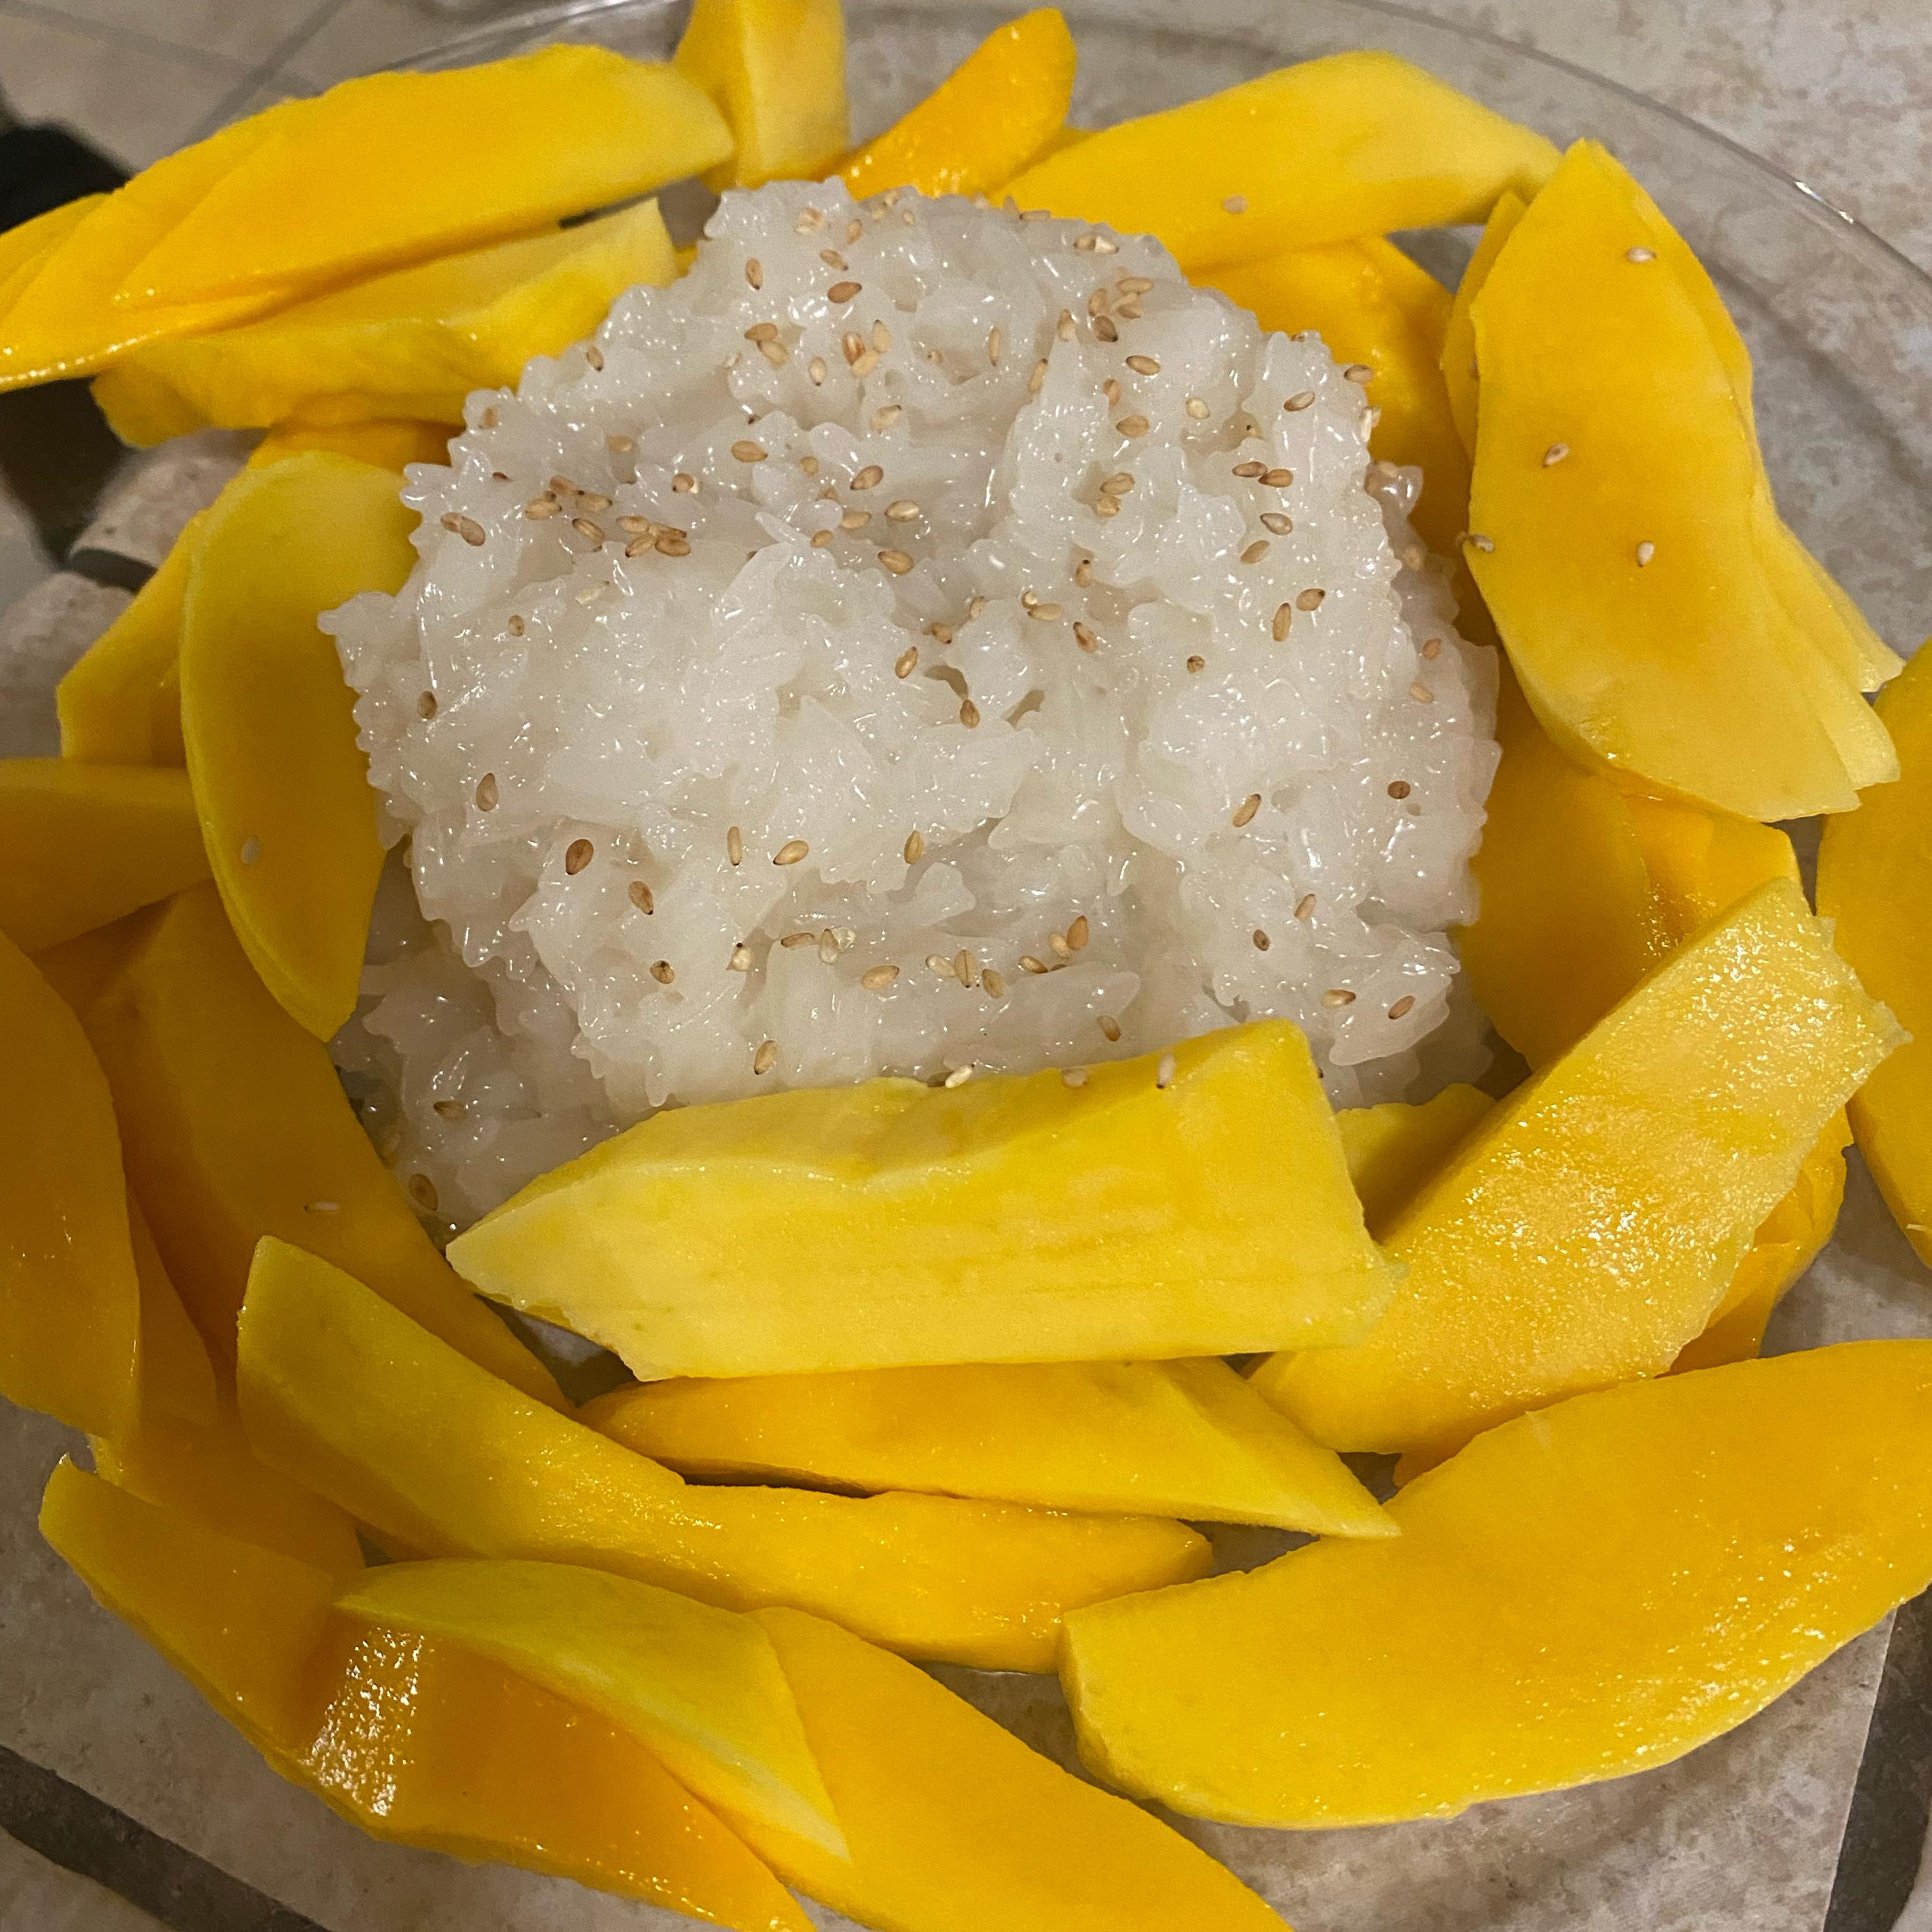 Thai Sweet Sticky Rice With Mango (Khao Neeo Mamuang) Karen Schaller Hickey